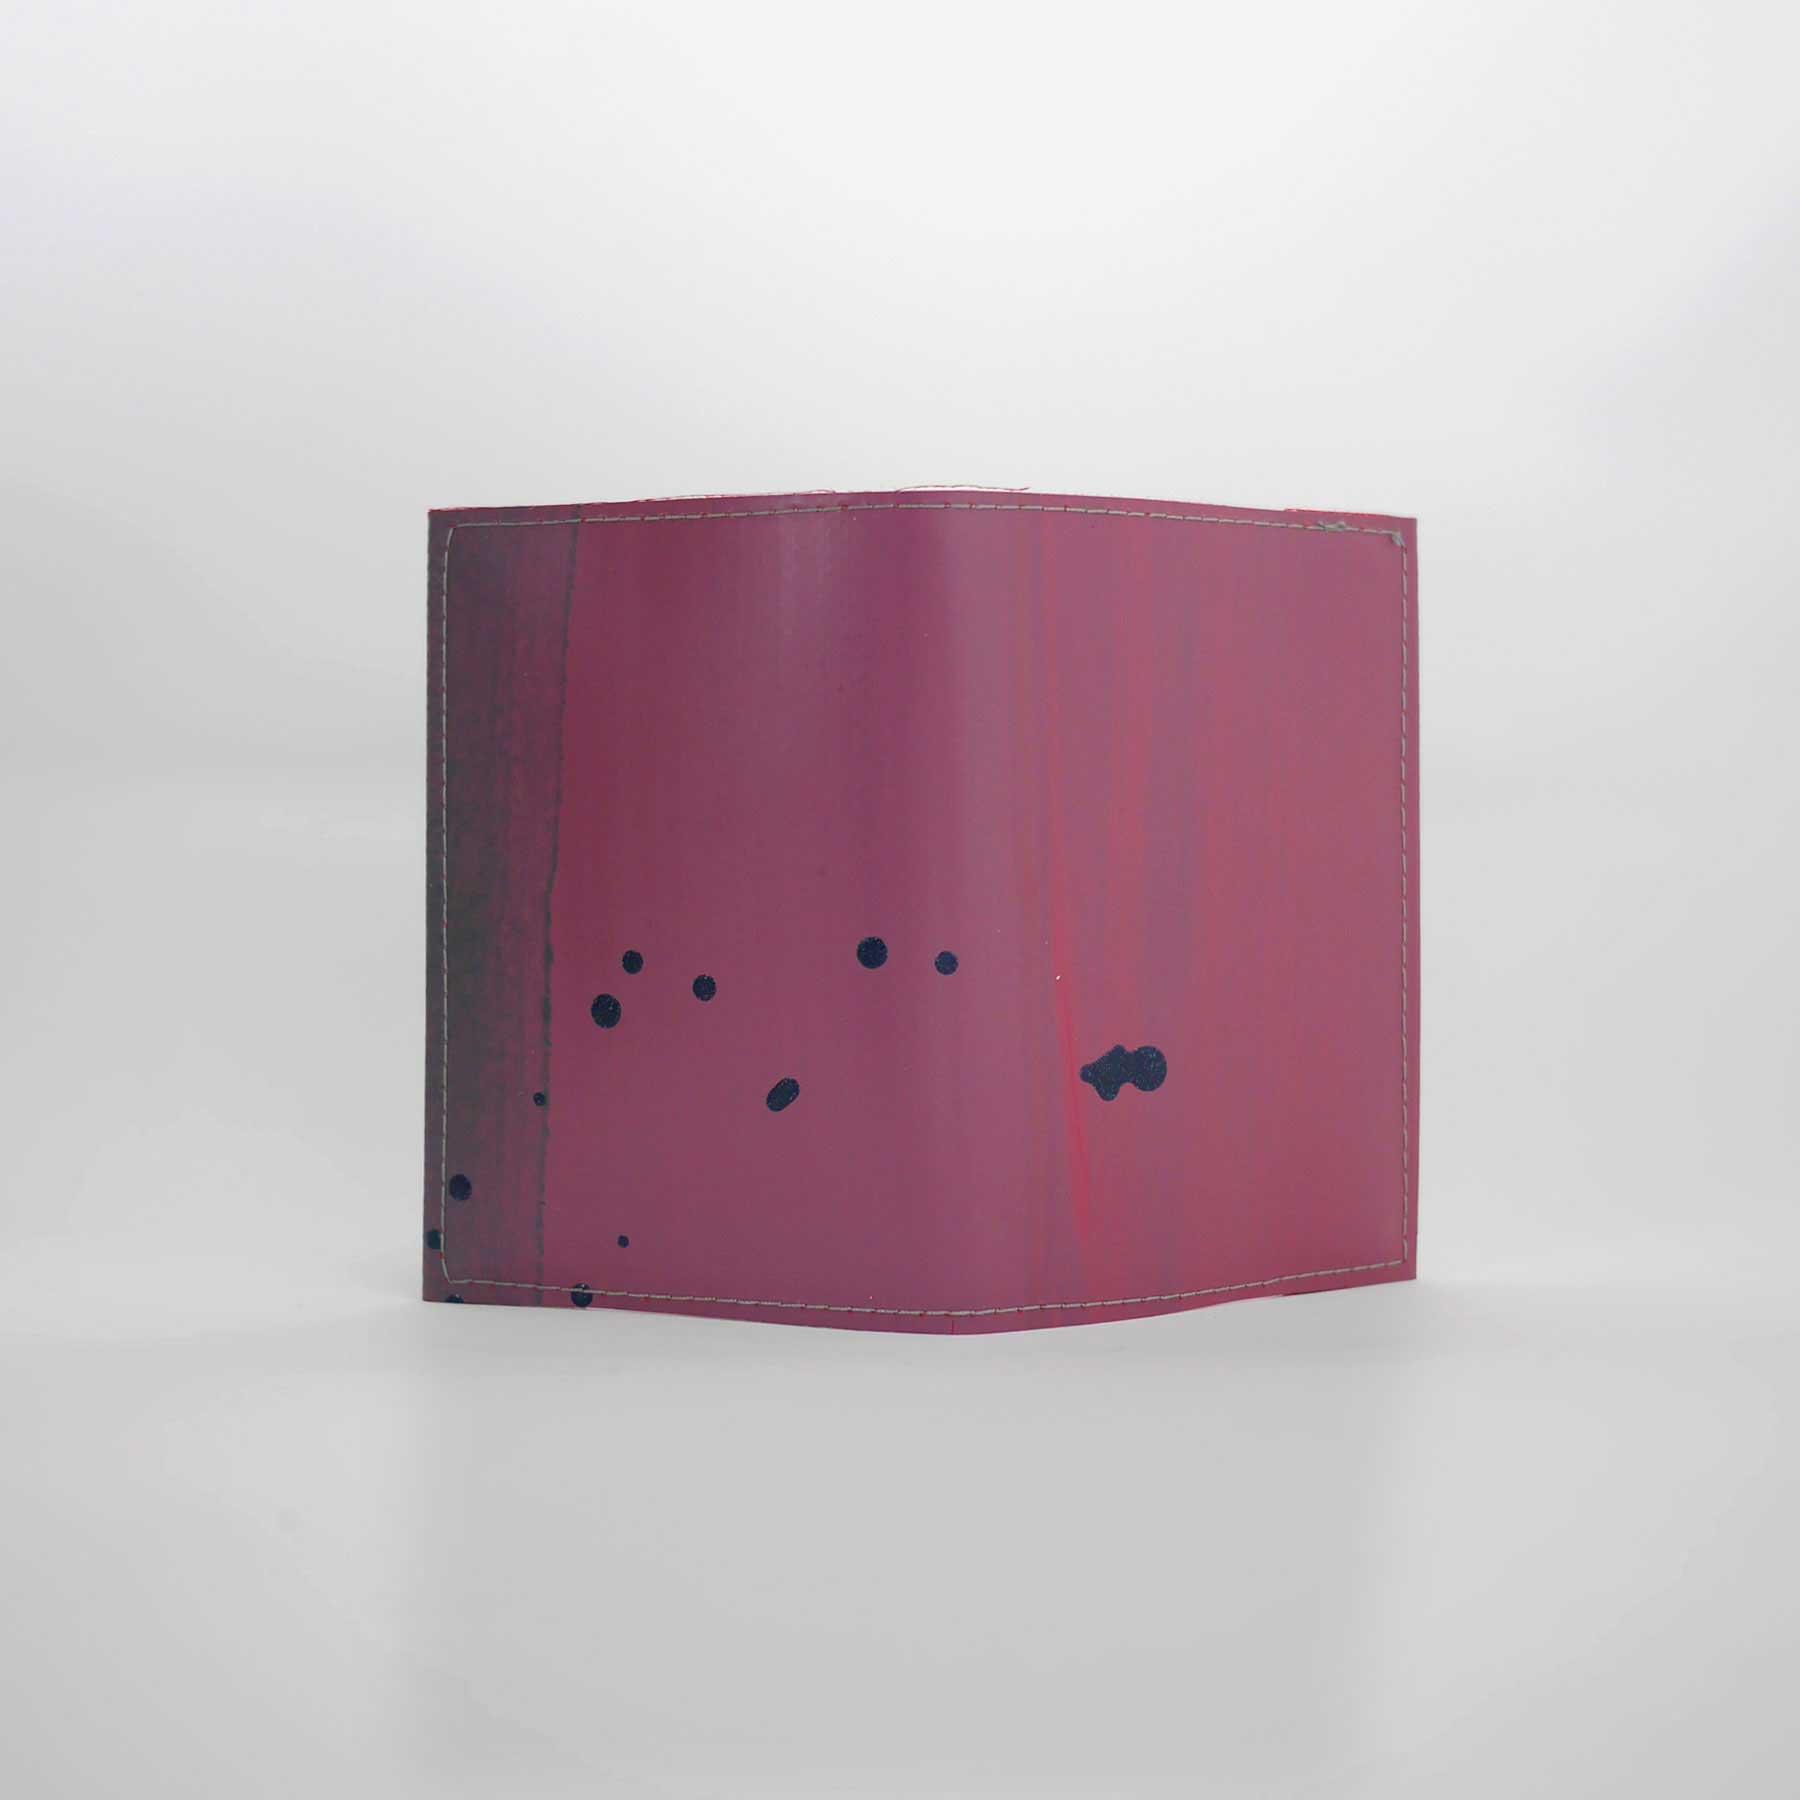 Porta passaporto llumi rosa